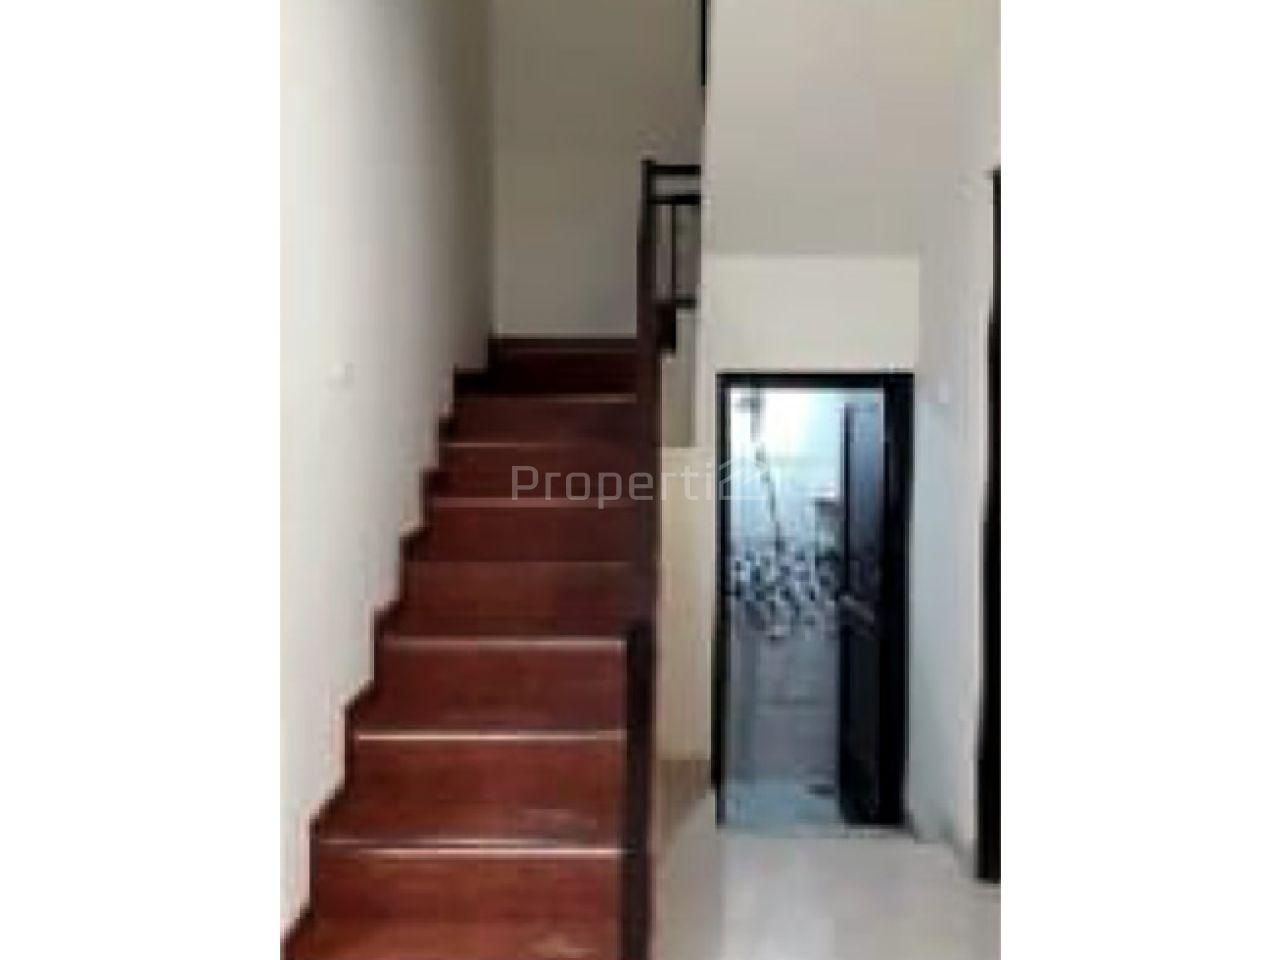 Rumah Baru Minimalis di Tebet Barat, Jakarta Selatan